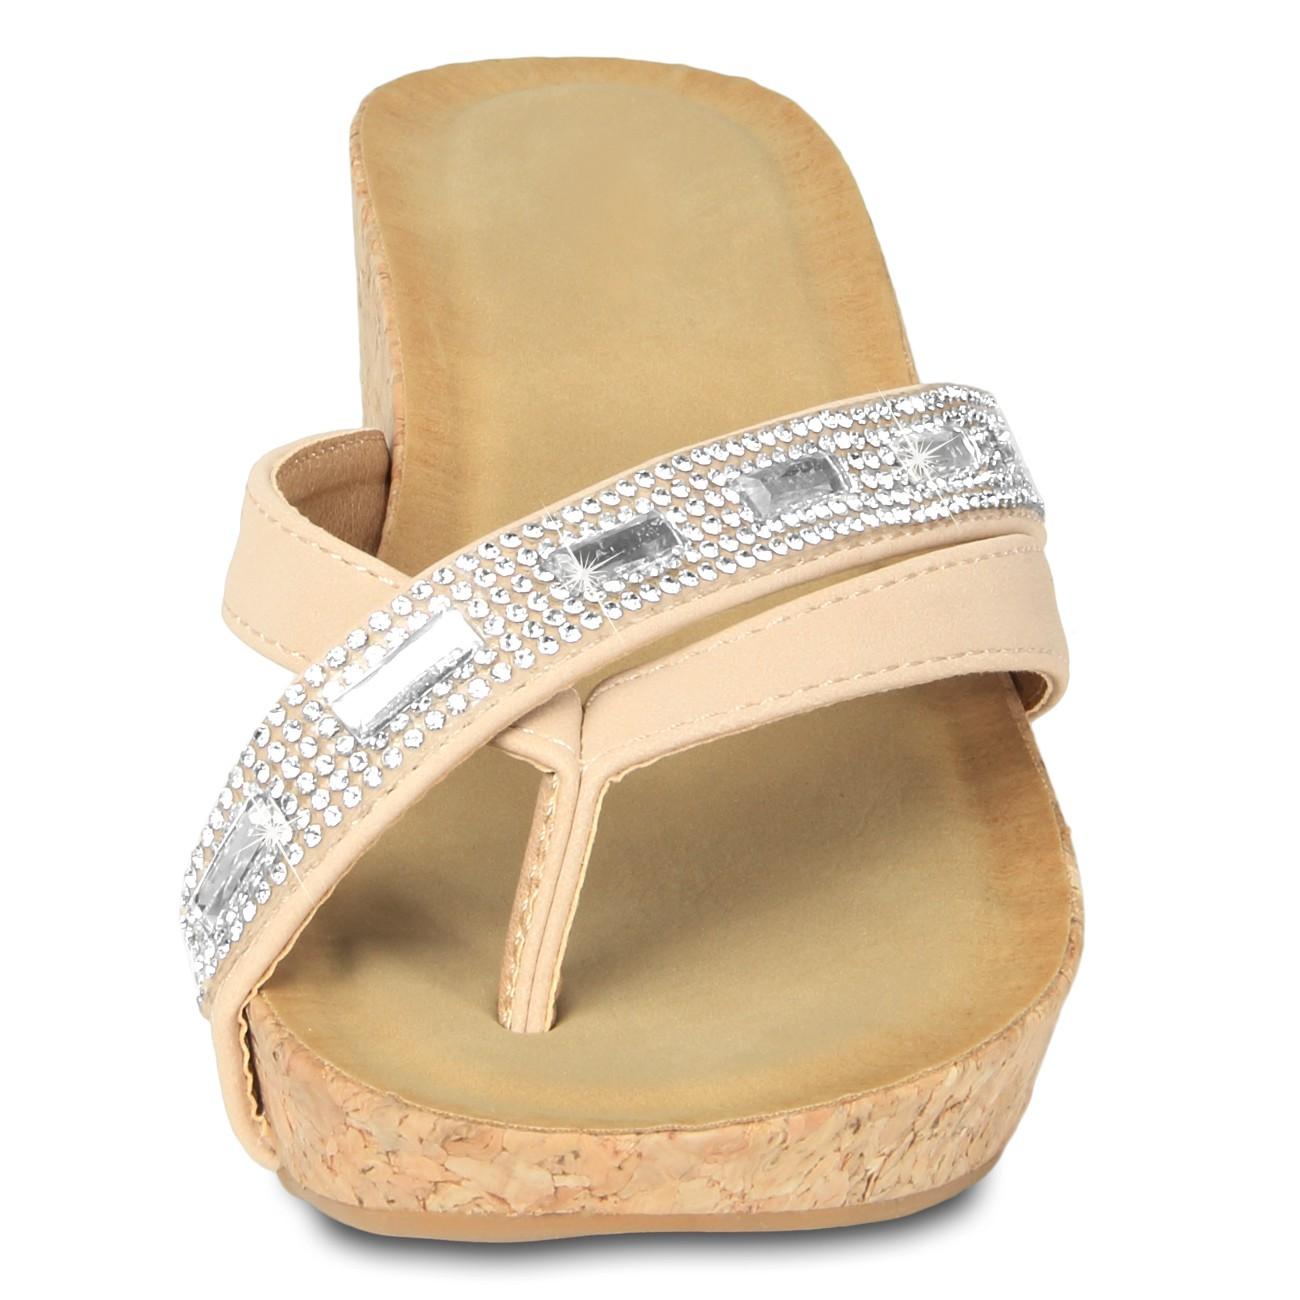 sandalen mit steinen caspar damen sandaletten sandalen. Black Bedroom Furniture Sets. Home Design Ideas